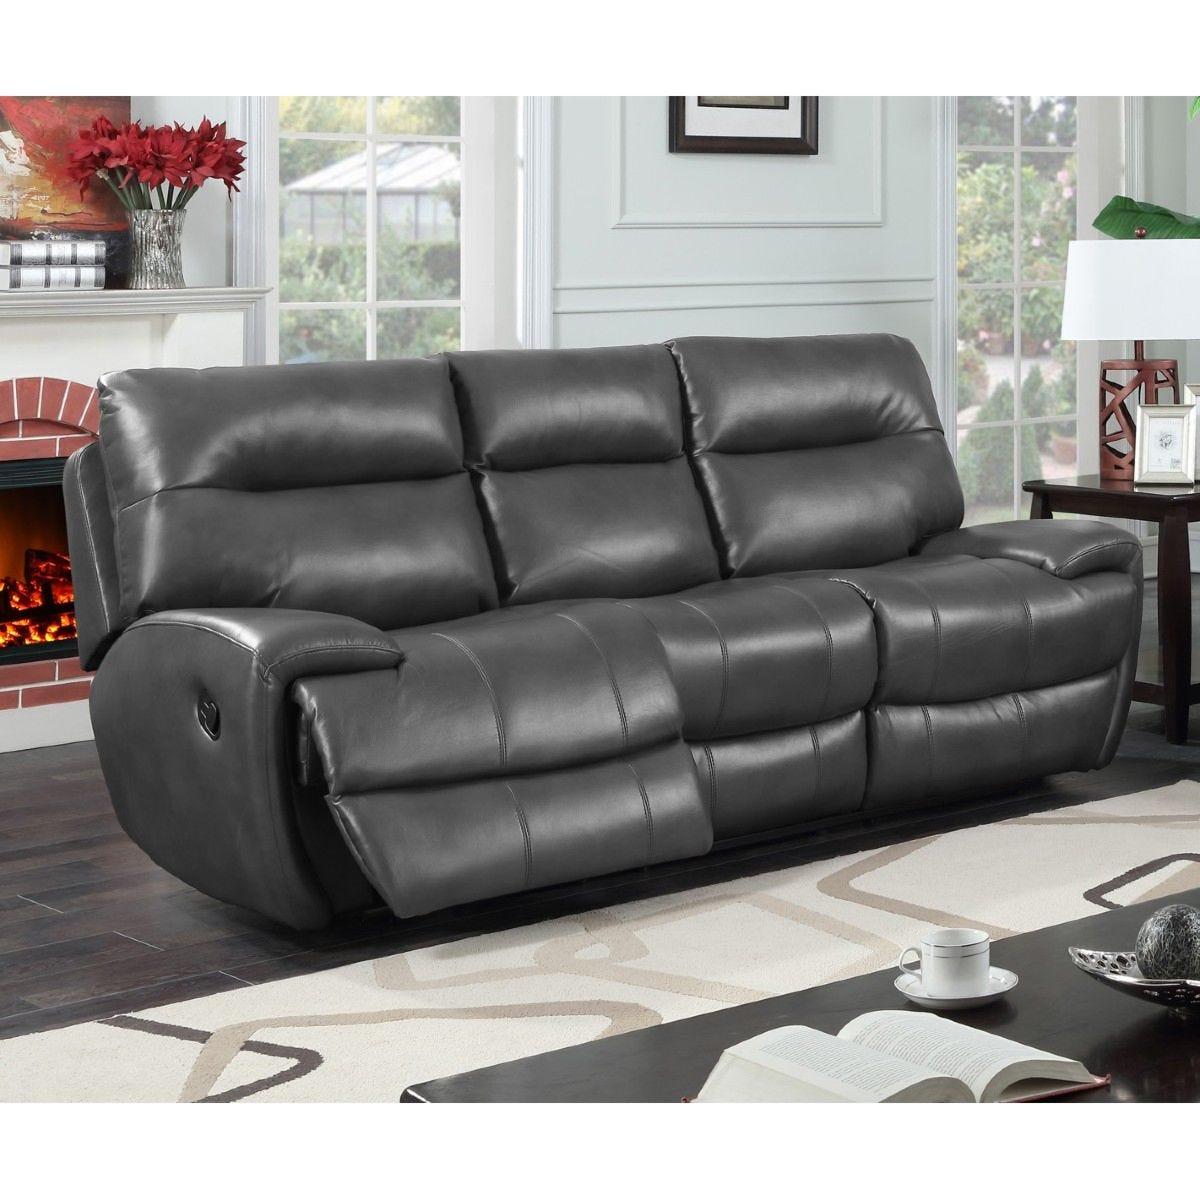 Bampton Recliner 3 Seater Faux Leather Sofa Grey